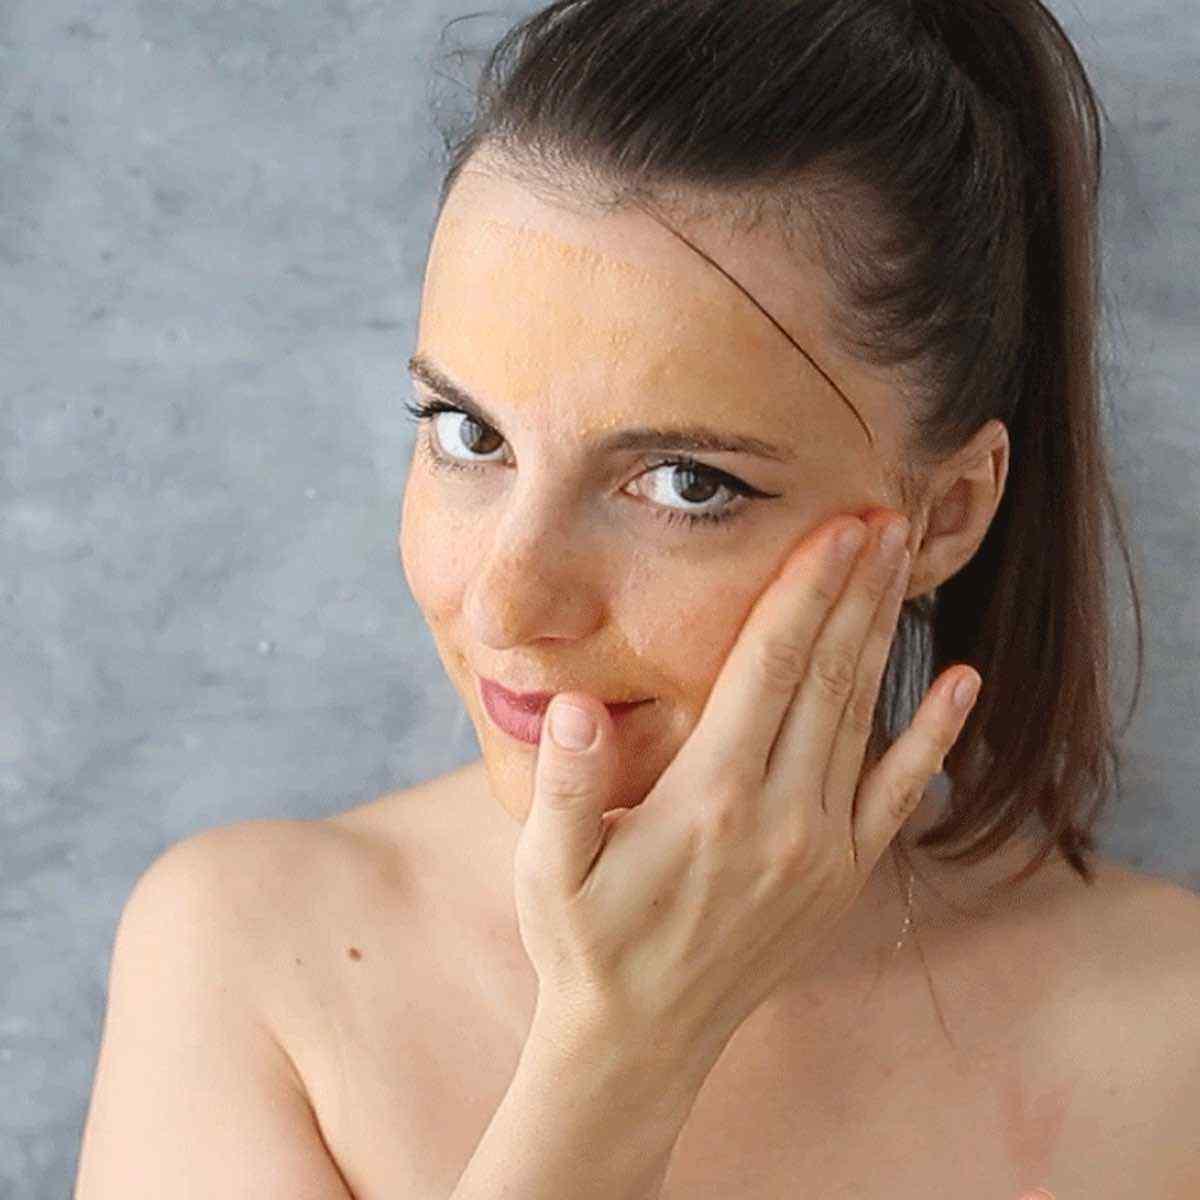 Cold Pressed Castor Oil Face Mask for Smooth Skin